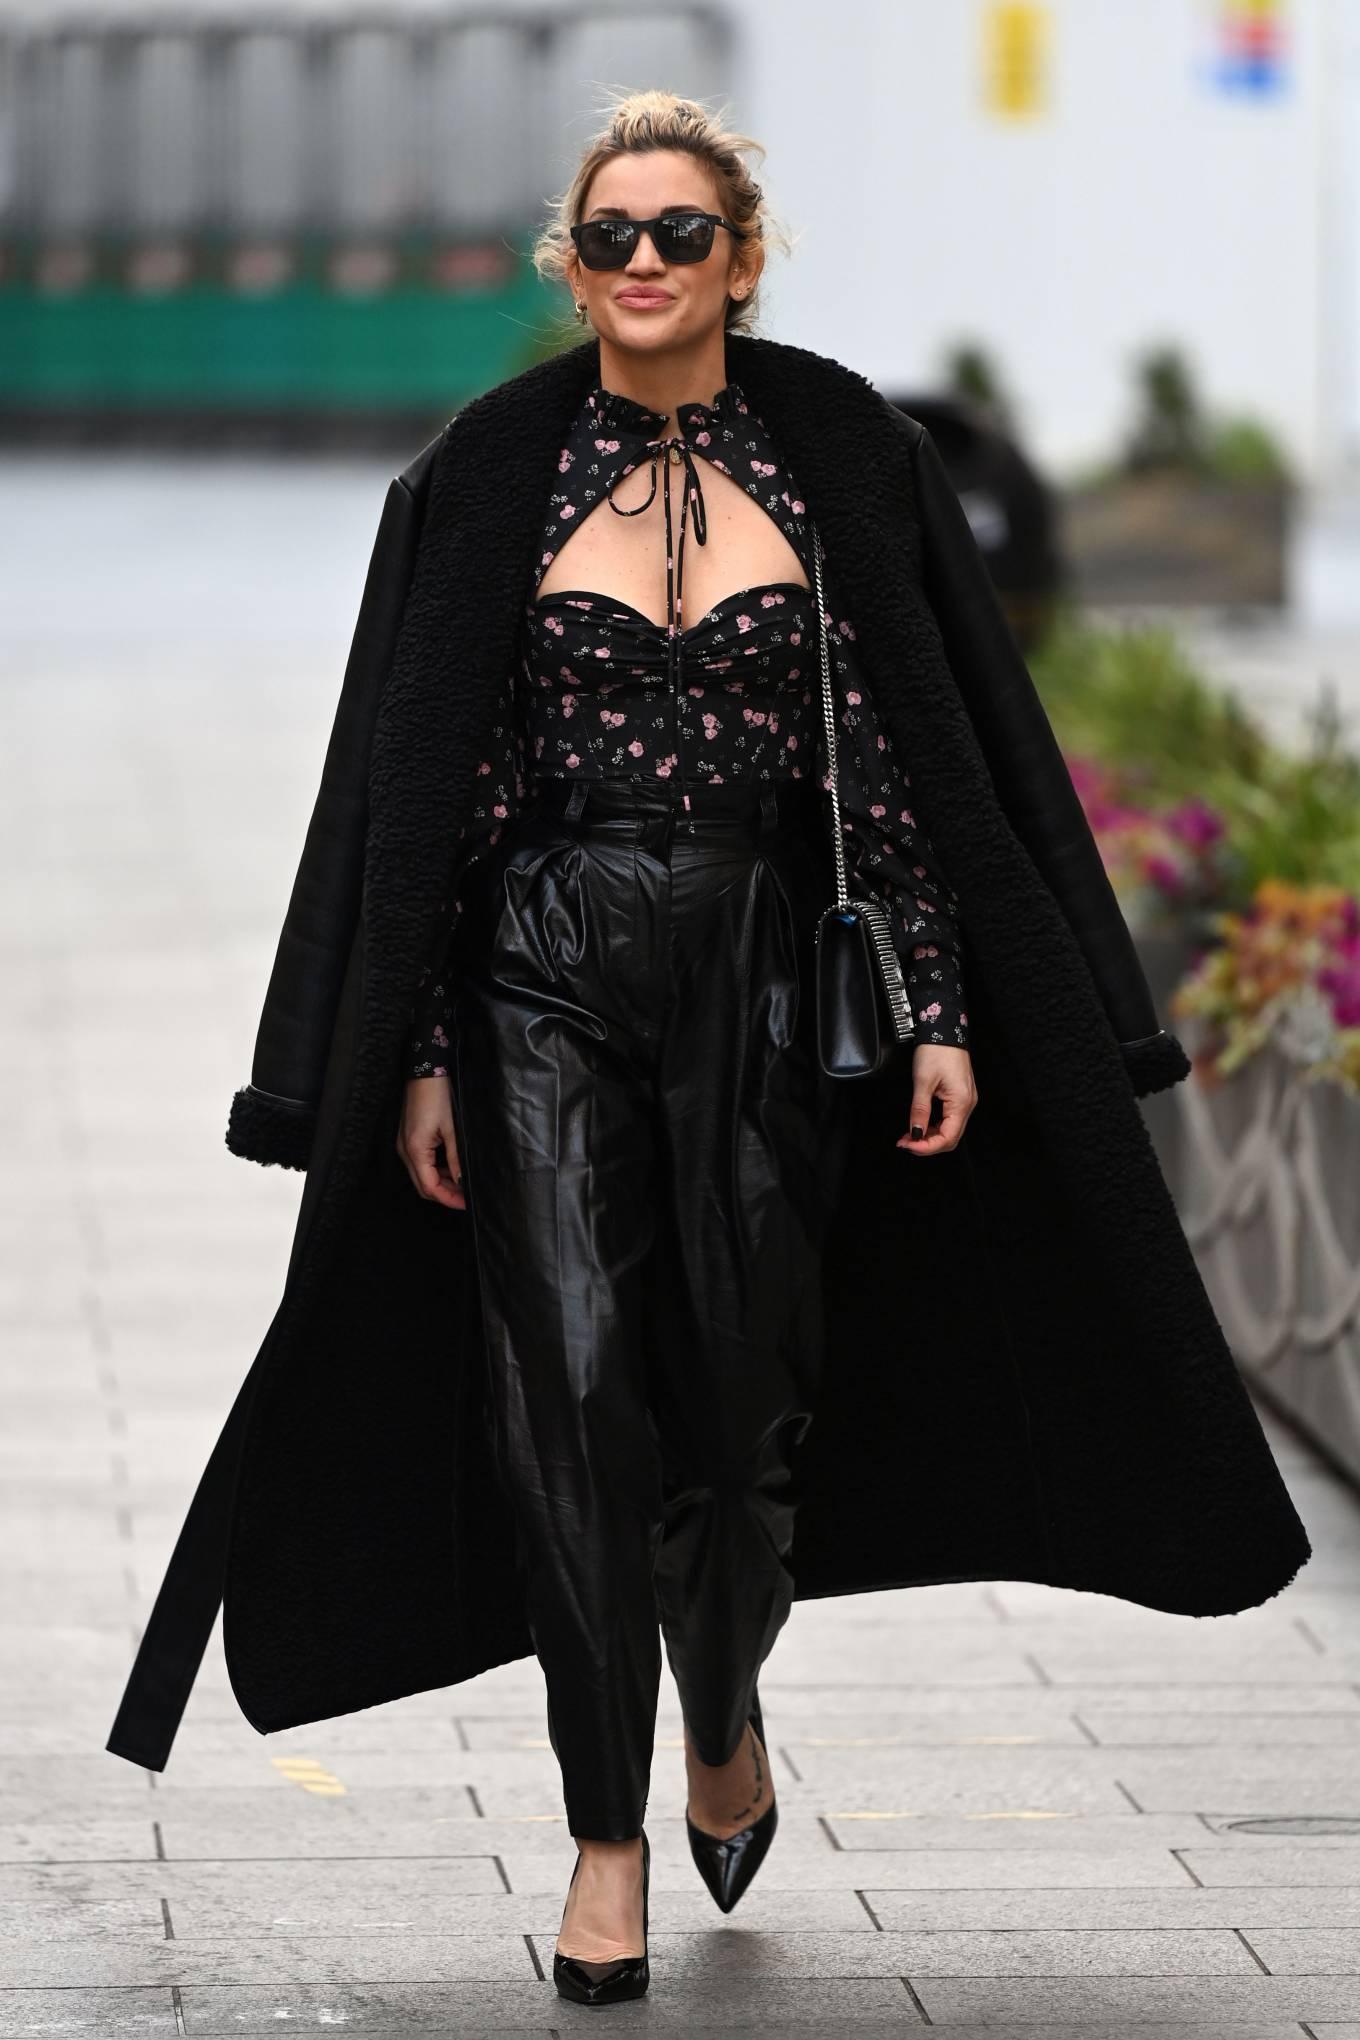 Ashley Roberts - Looks chic leaving the Global Radio Studios in London